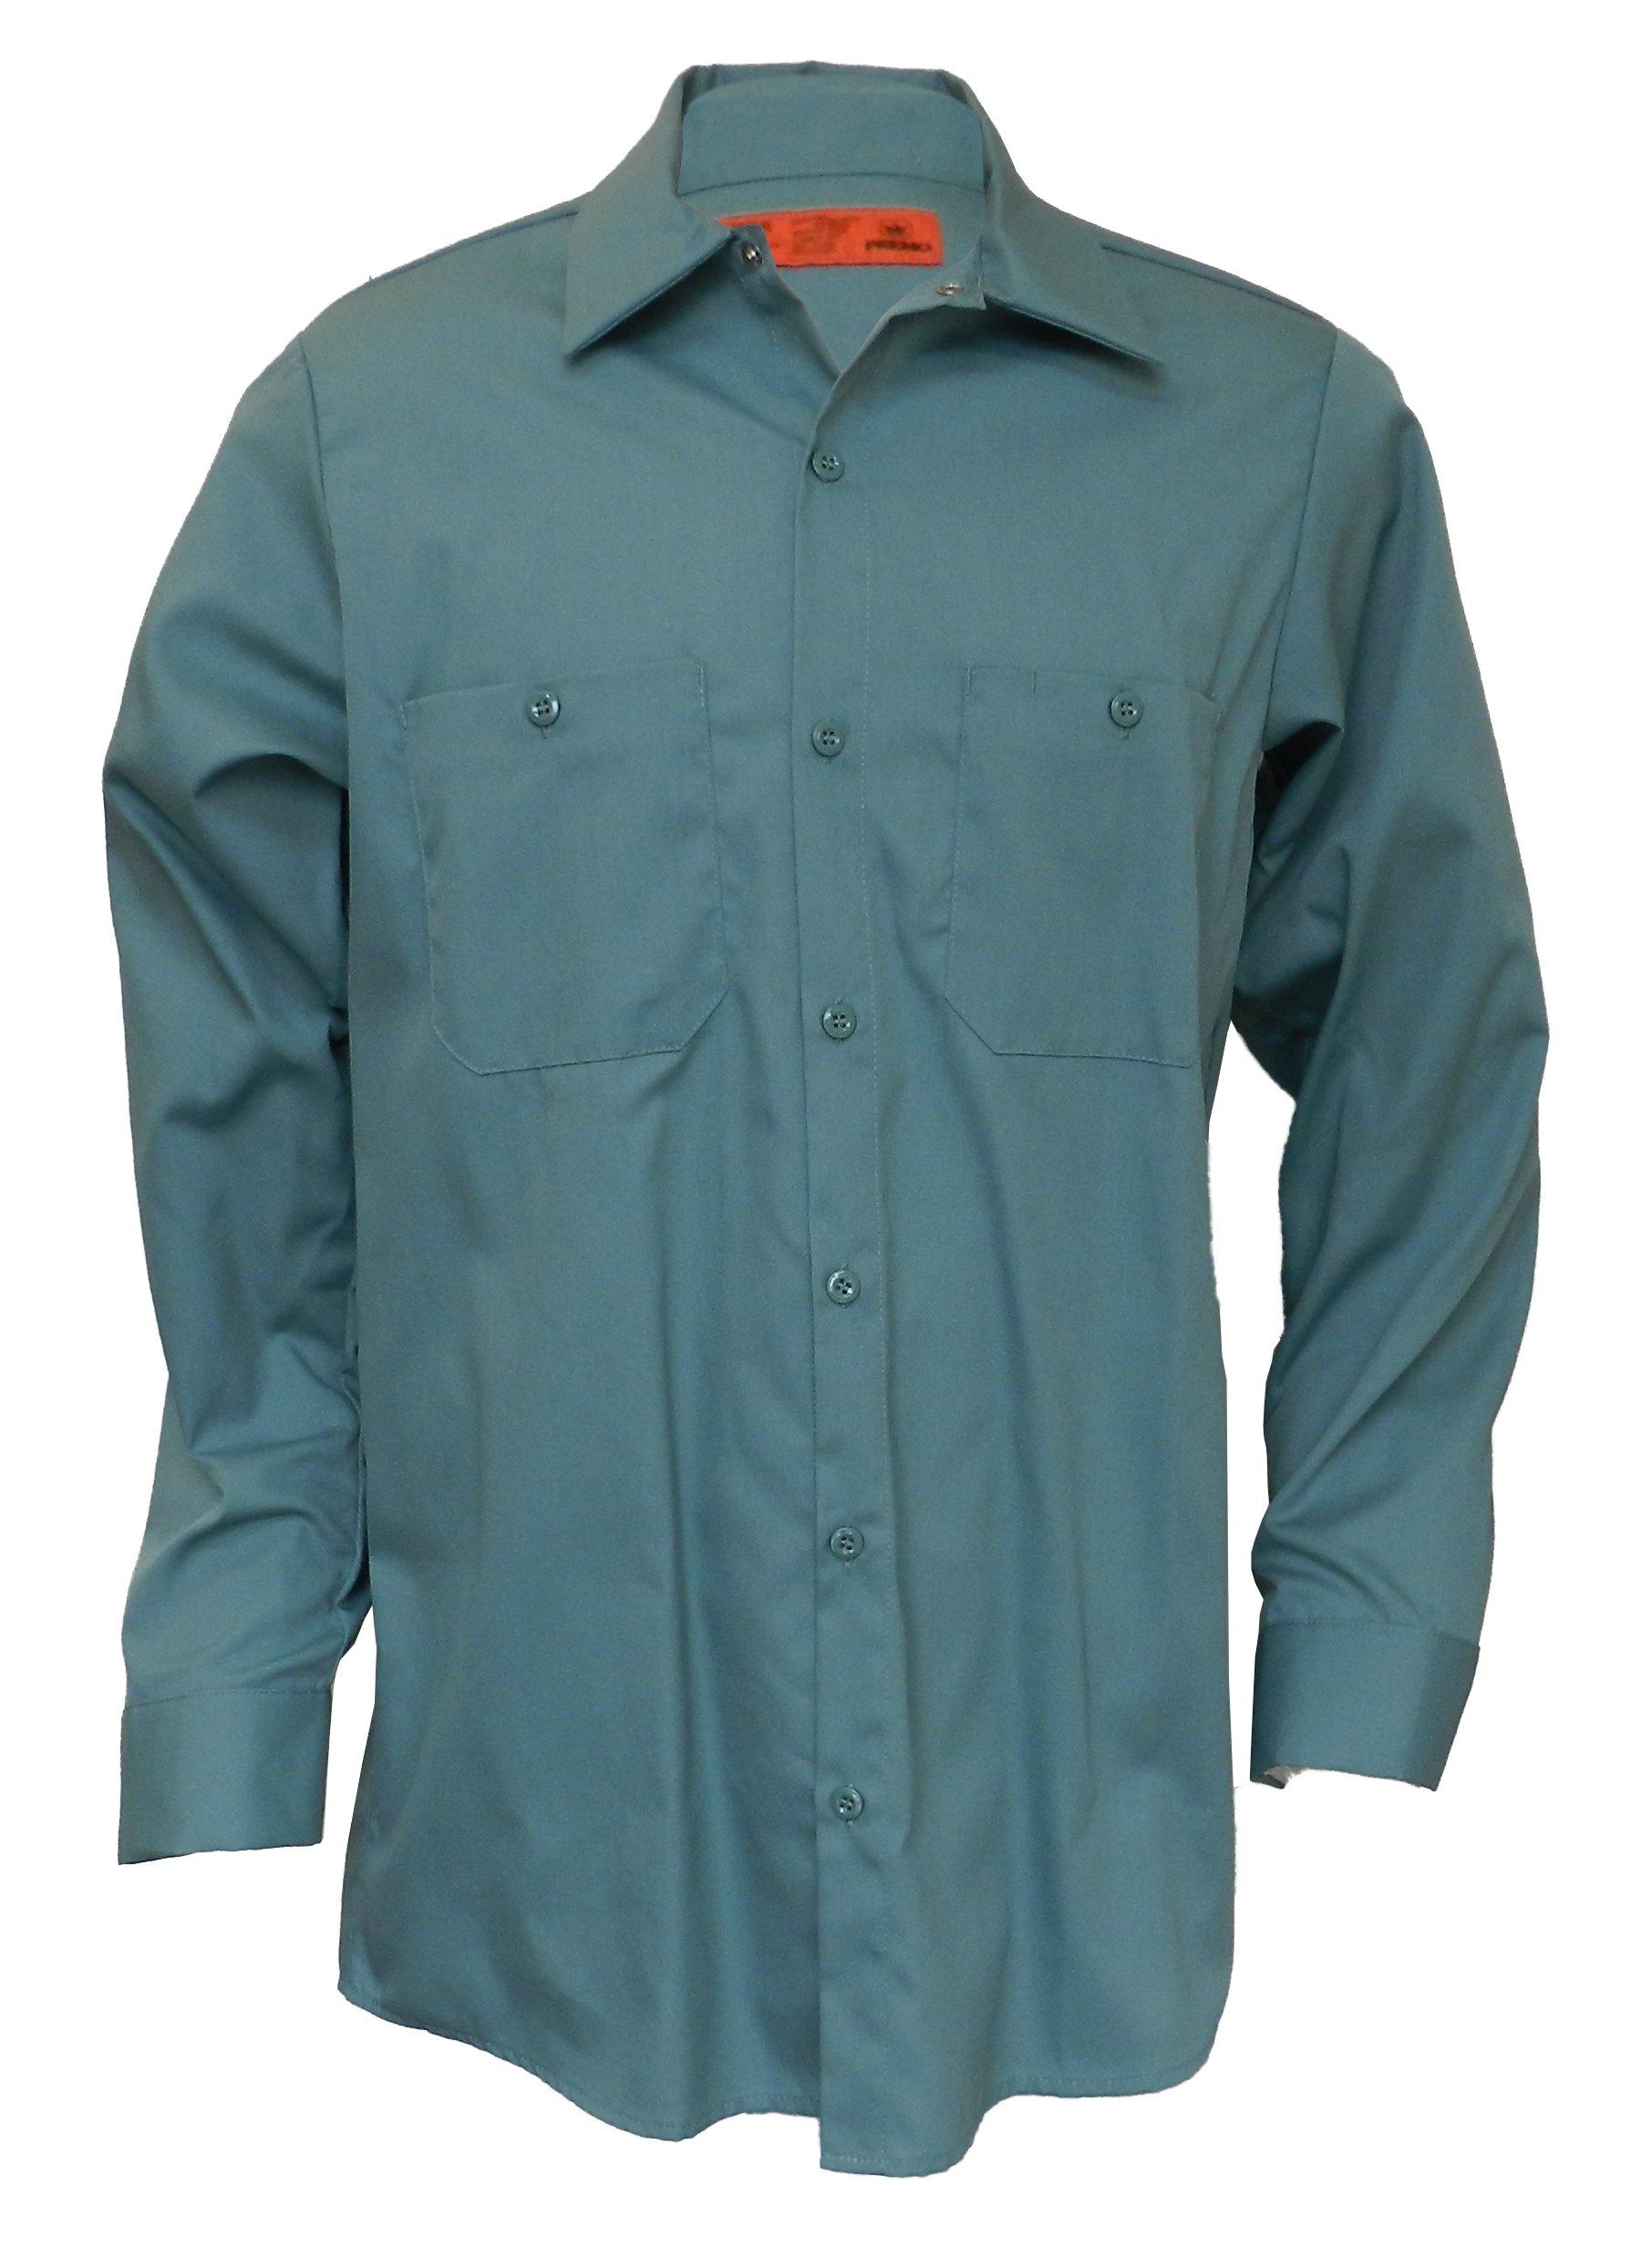 Industrial Long Sleeve Work Shirt MS14, Light Green, Small